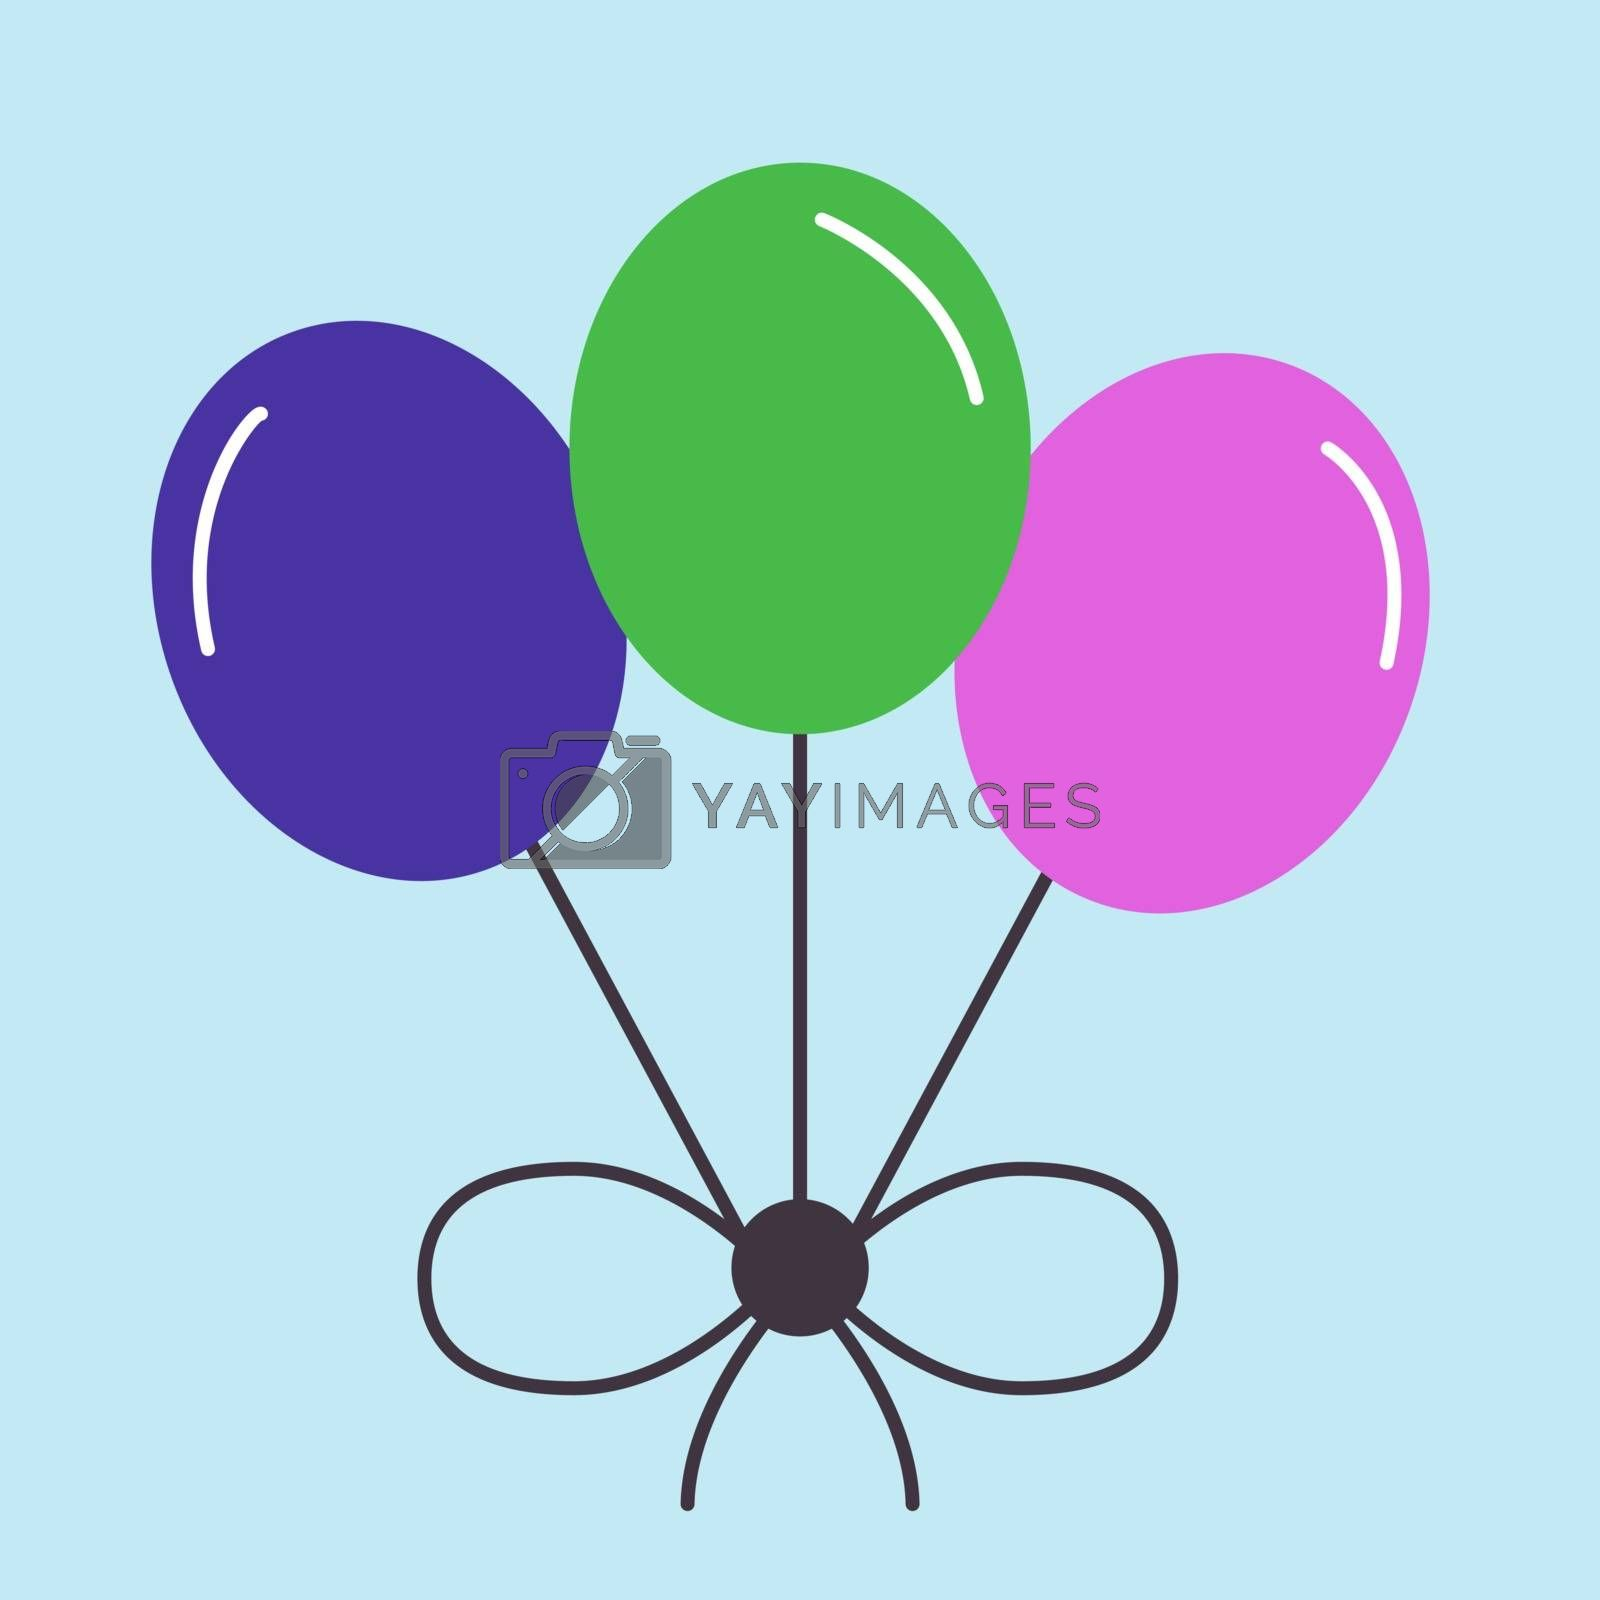 Balloons, illustration, vector on white background.